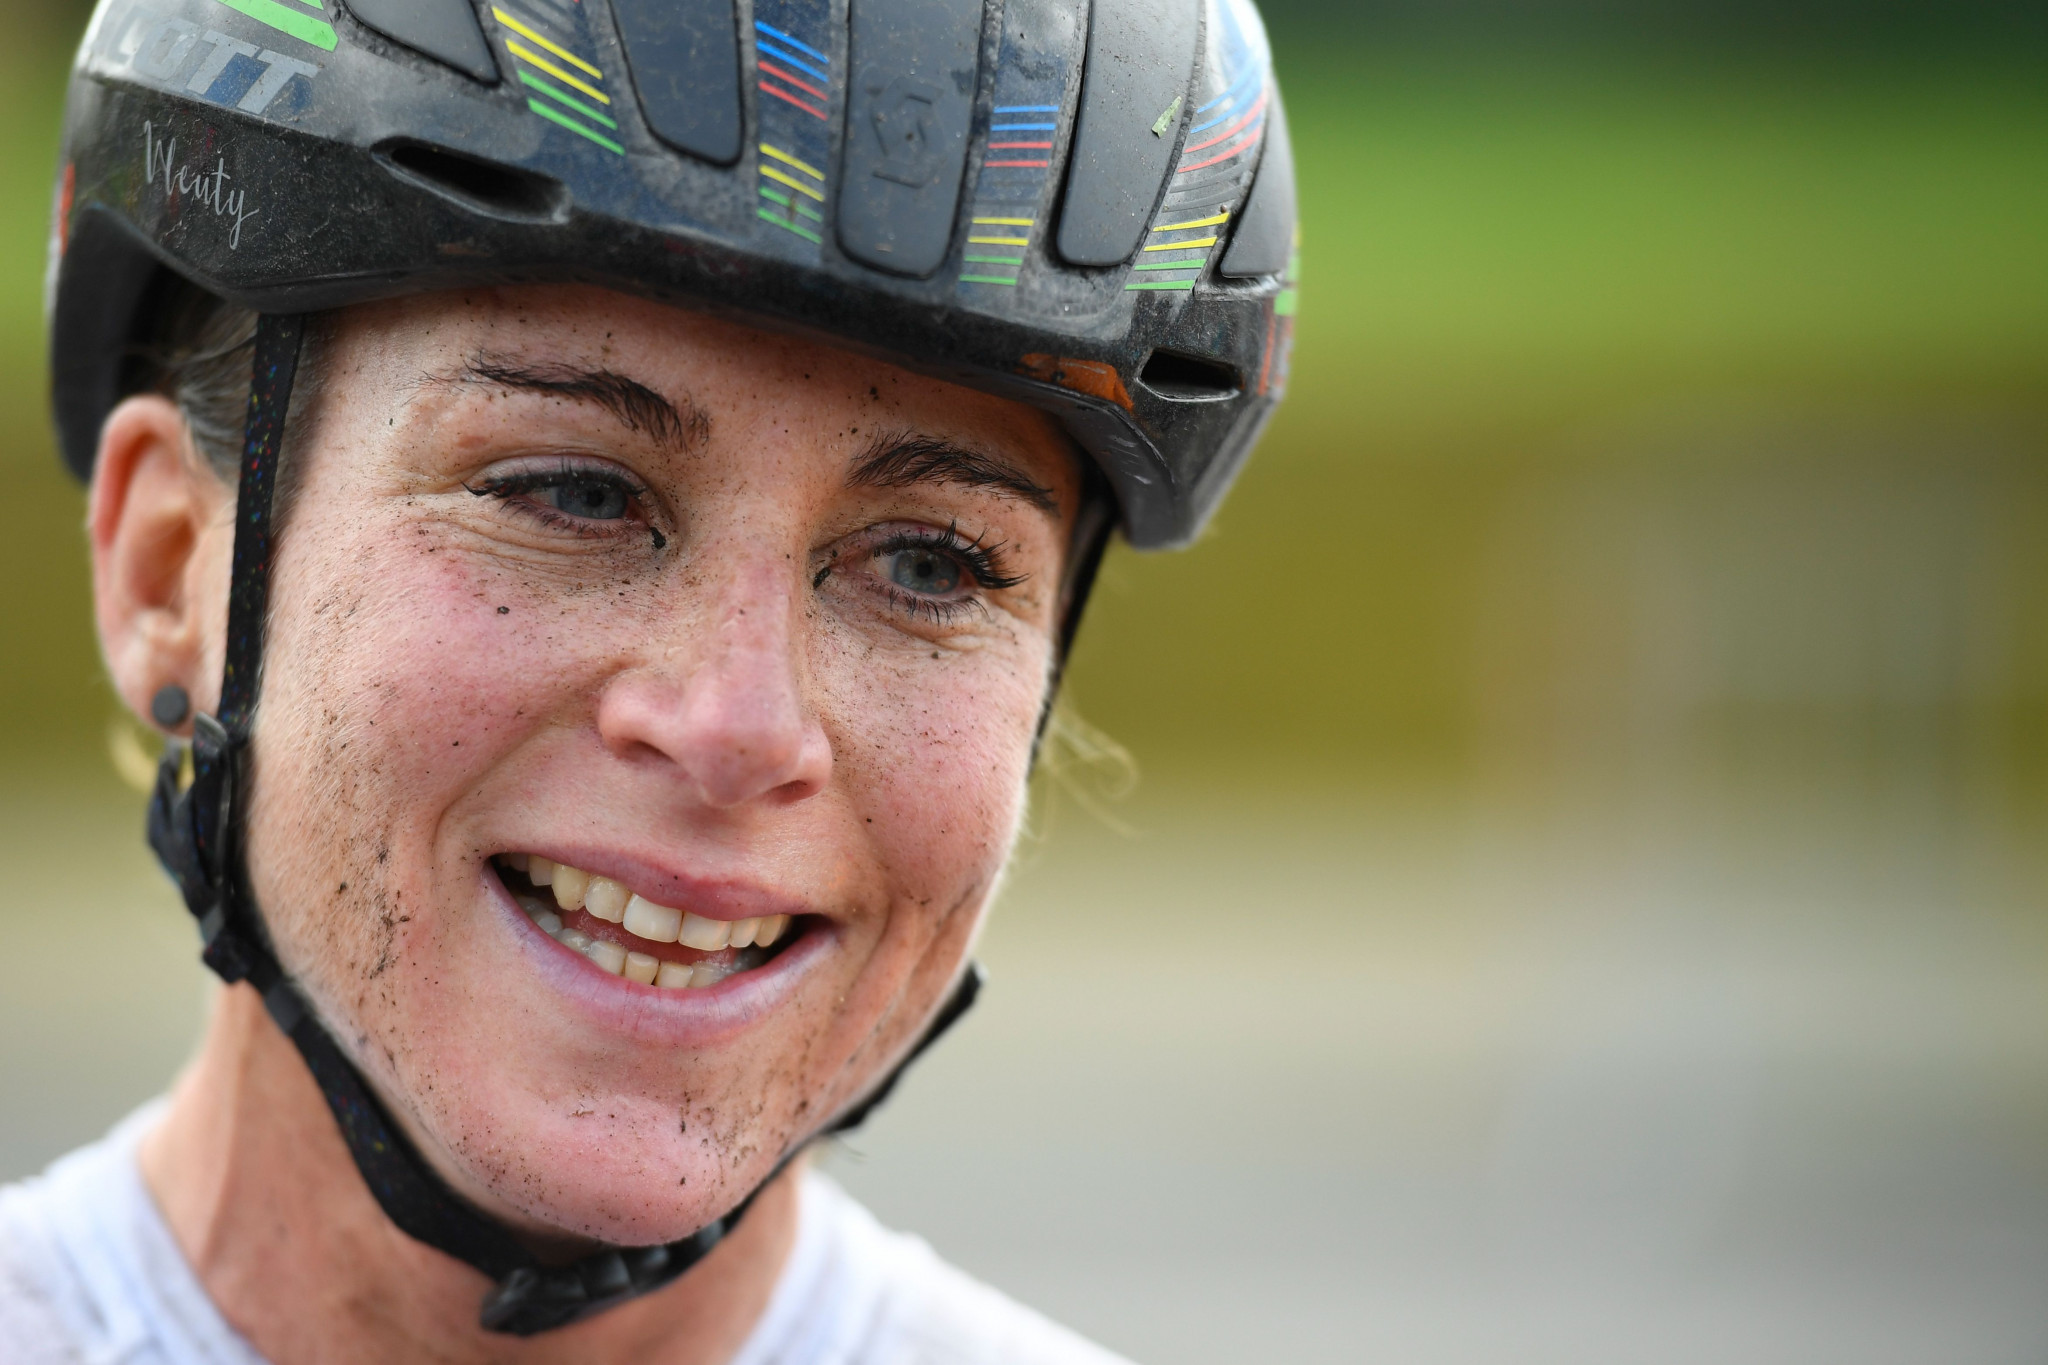 Annemiek Van Vleuten will aim for a third consecutive Strade Bianche title ©Getty Images